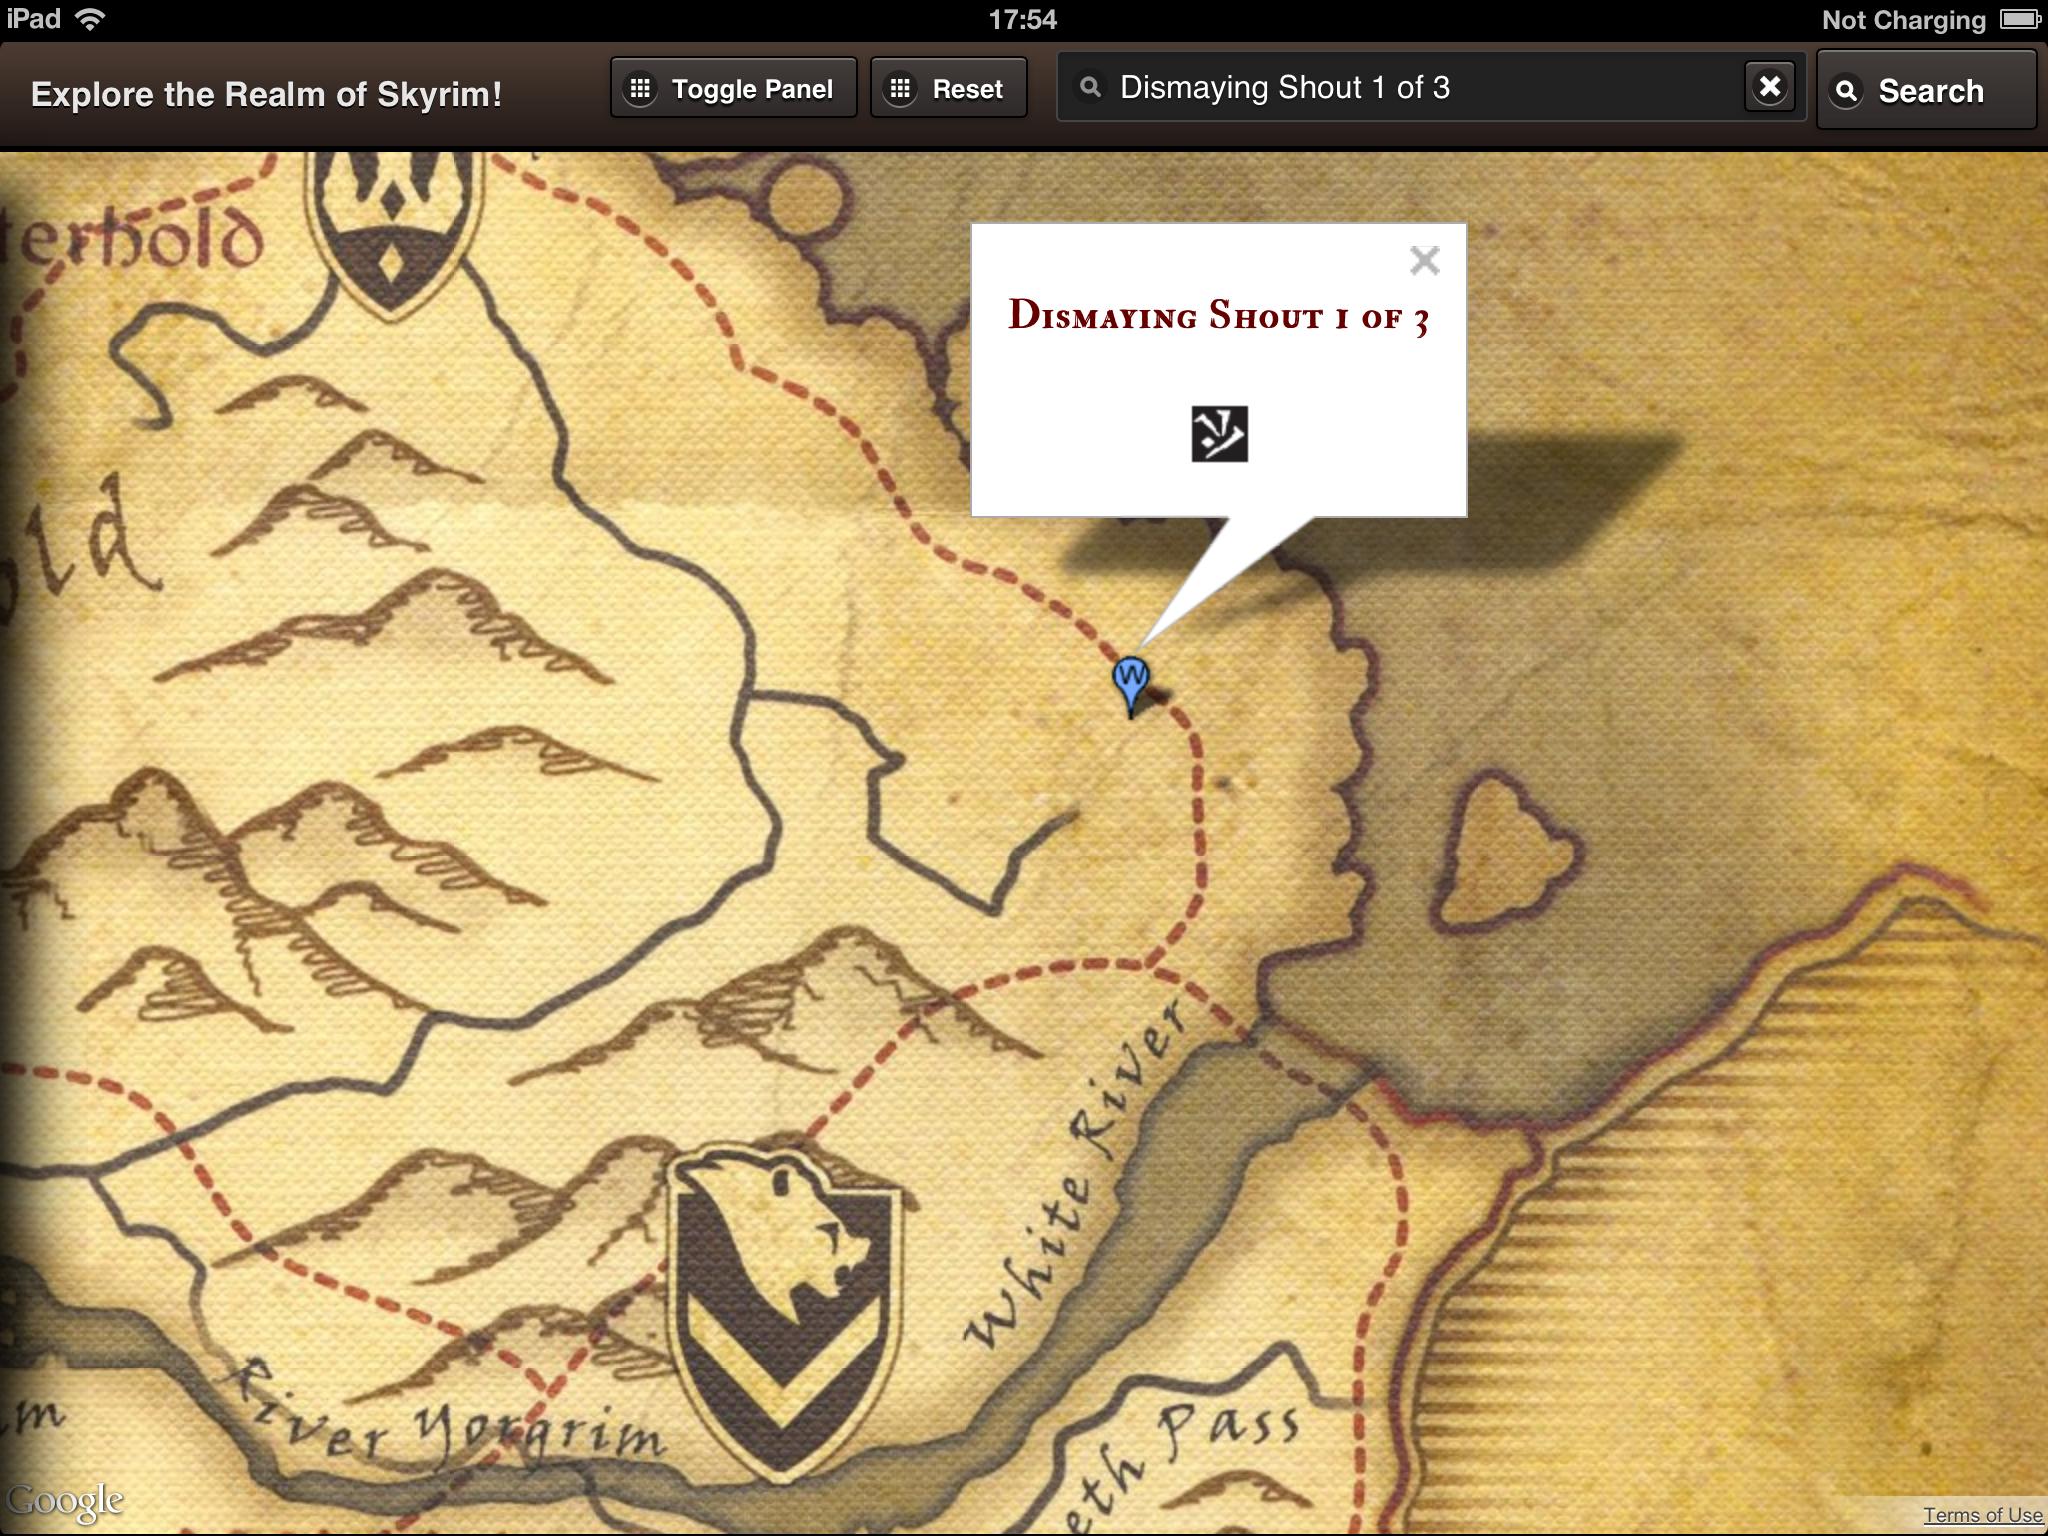 An Interactive Skyrim Map Realized By Leonardo Gandini